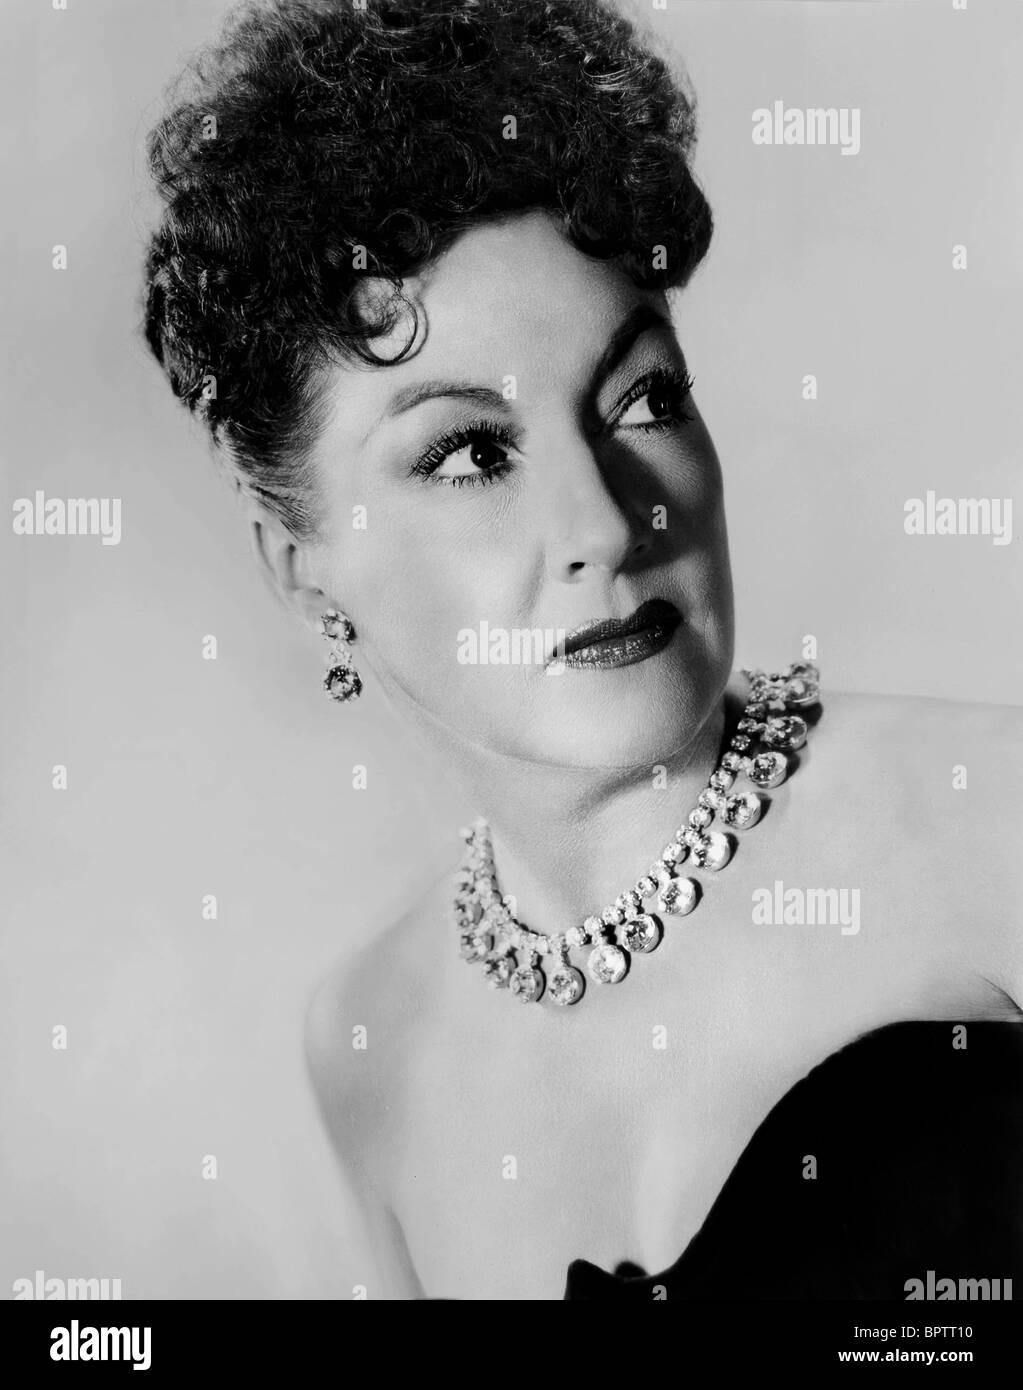 Cassandra Ponti (b. 1982) images